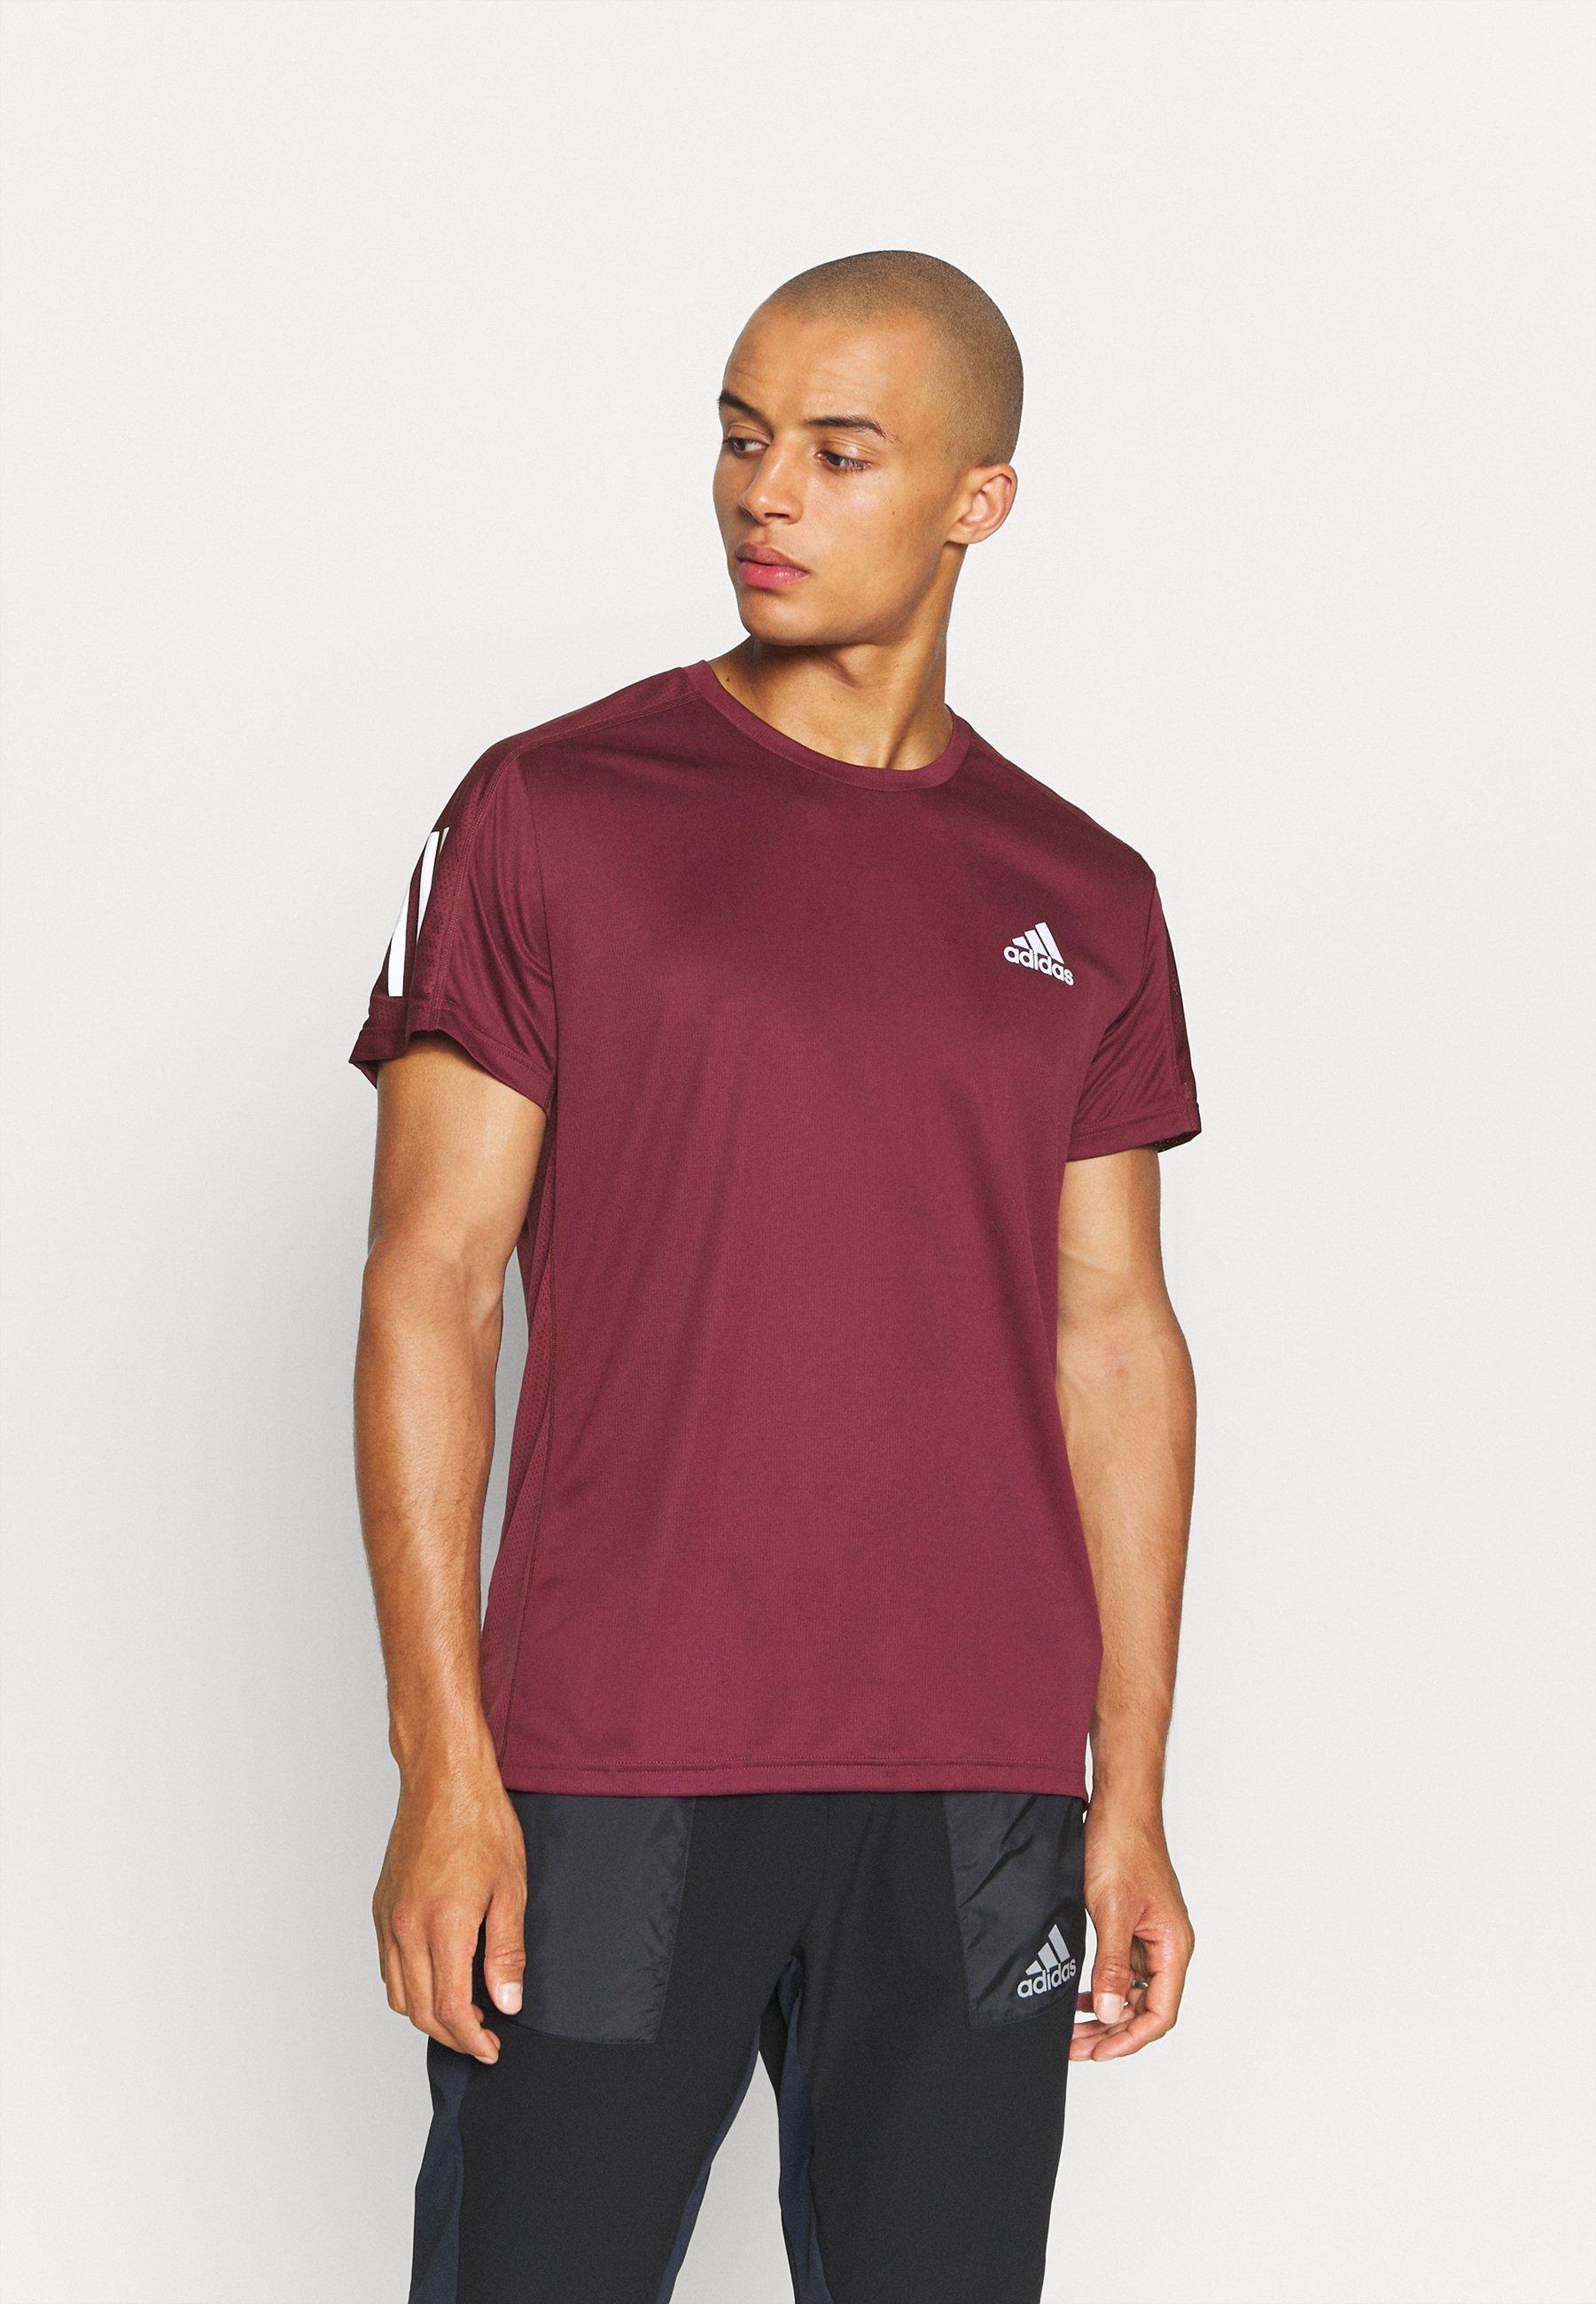 Men OWN THE RUNNING RESPONSE AEROREADY PRIMEGREEN T-SHIRT - Print T-shirt